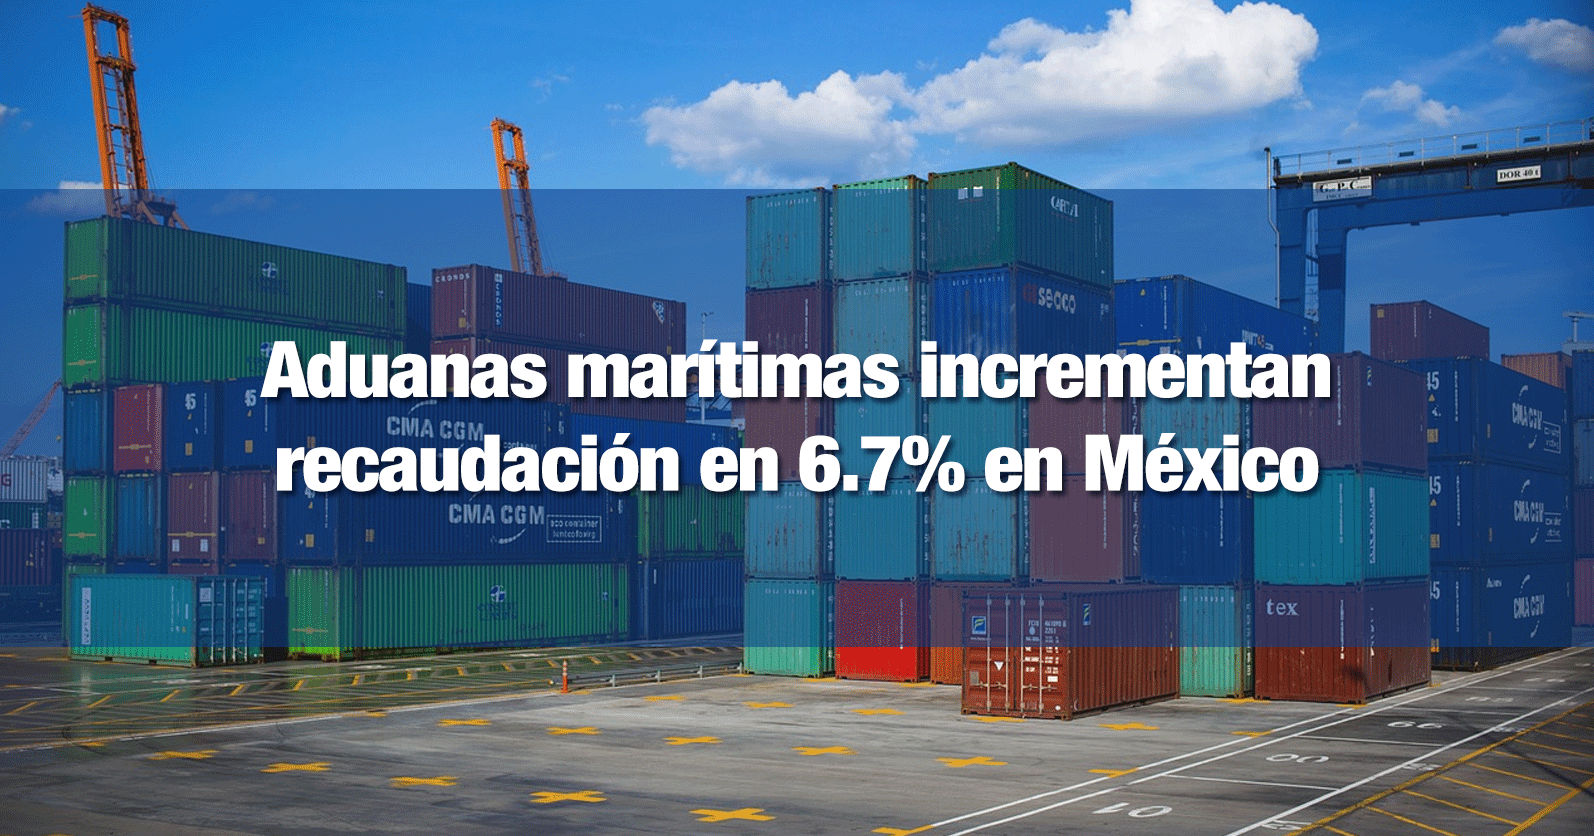 Aduanas marítimas incrementan recaudación en 6.7% en México